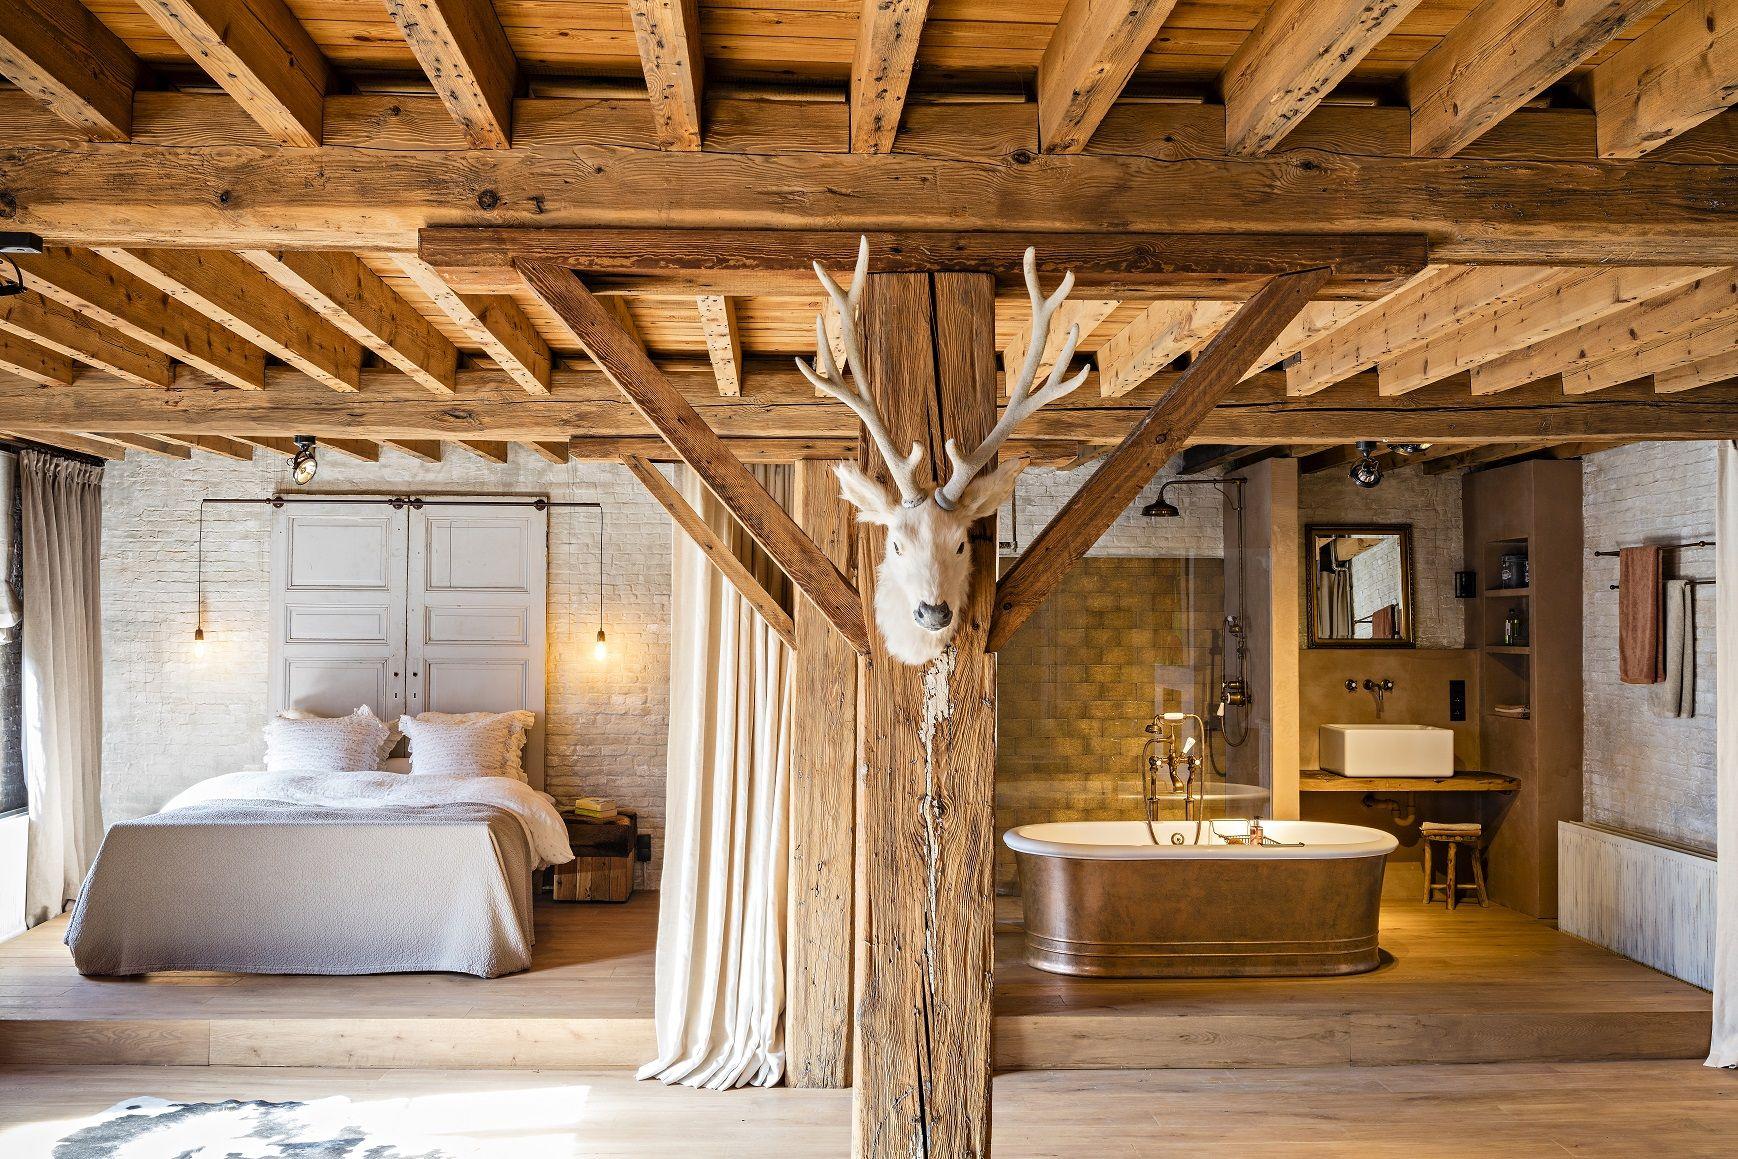 Strak Landelijke Badkamer : Strak landelijke keuken lovely strak landelijke keuken en badkamer